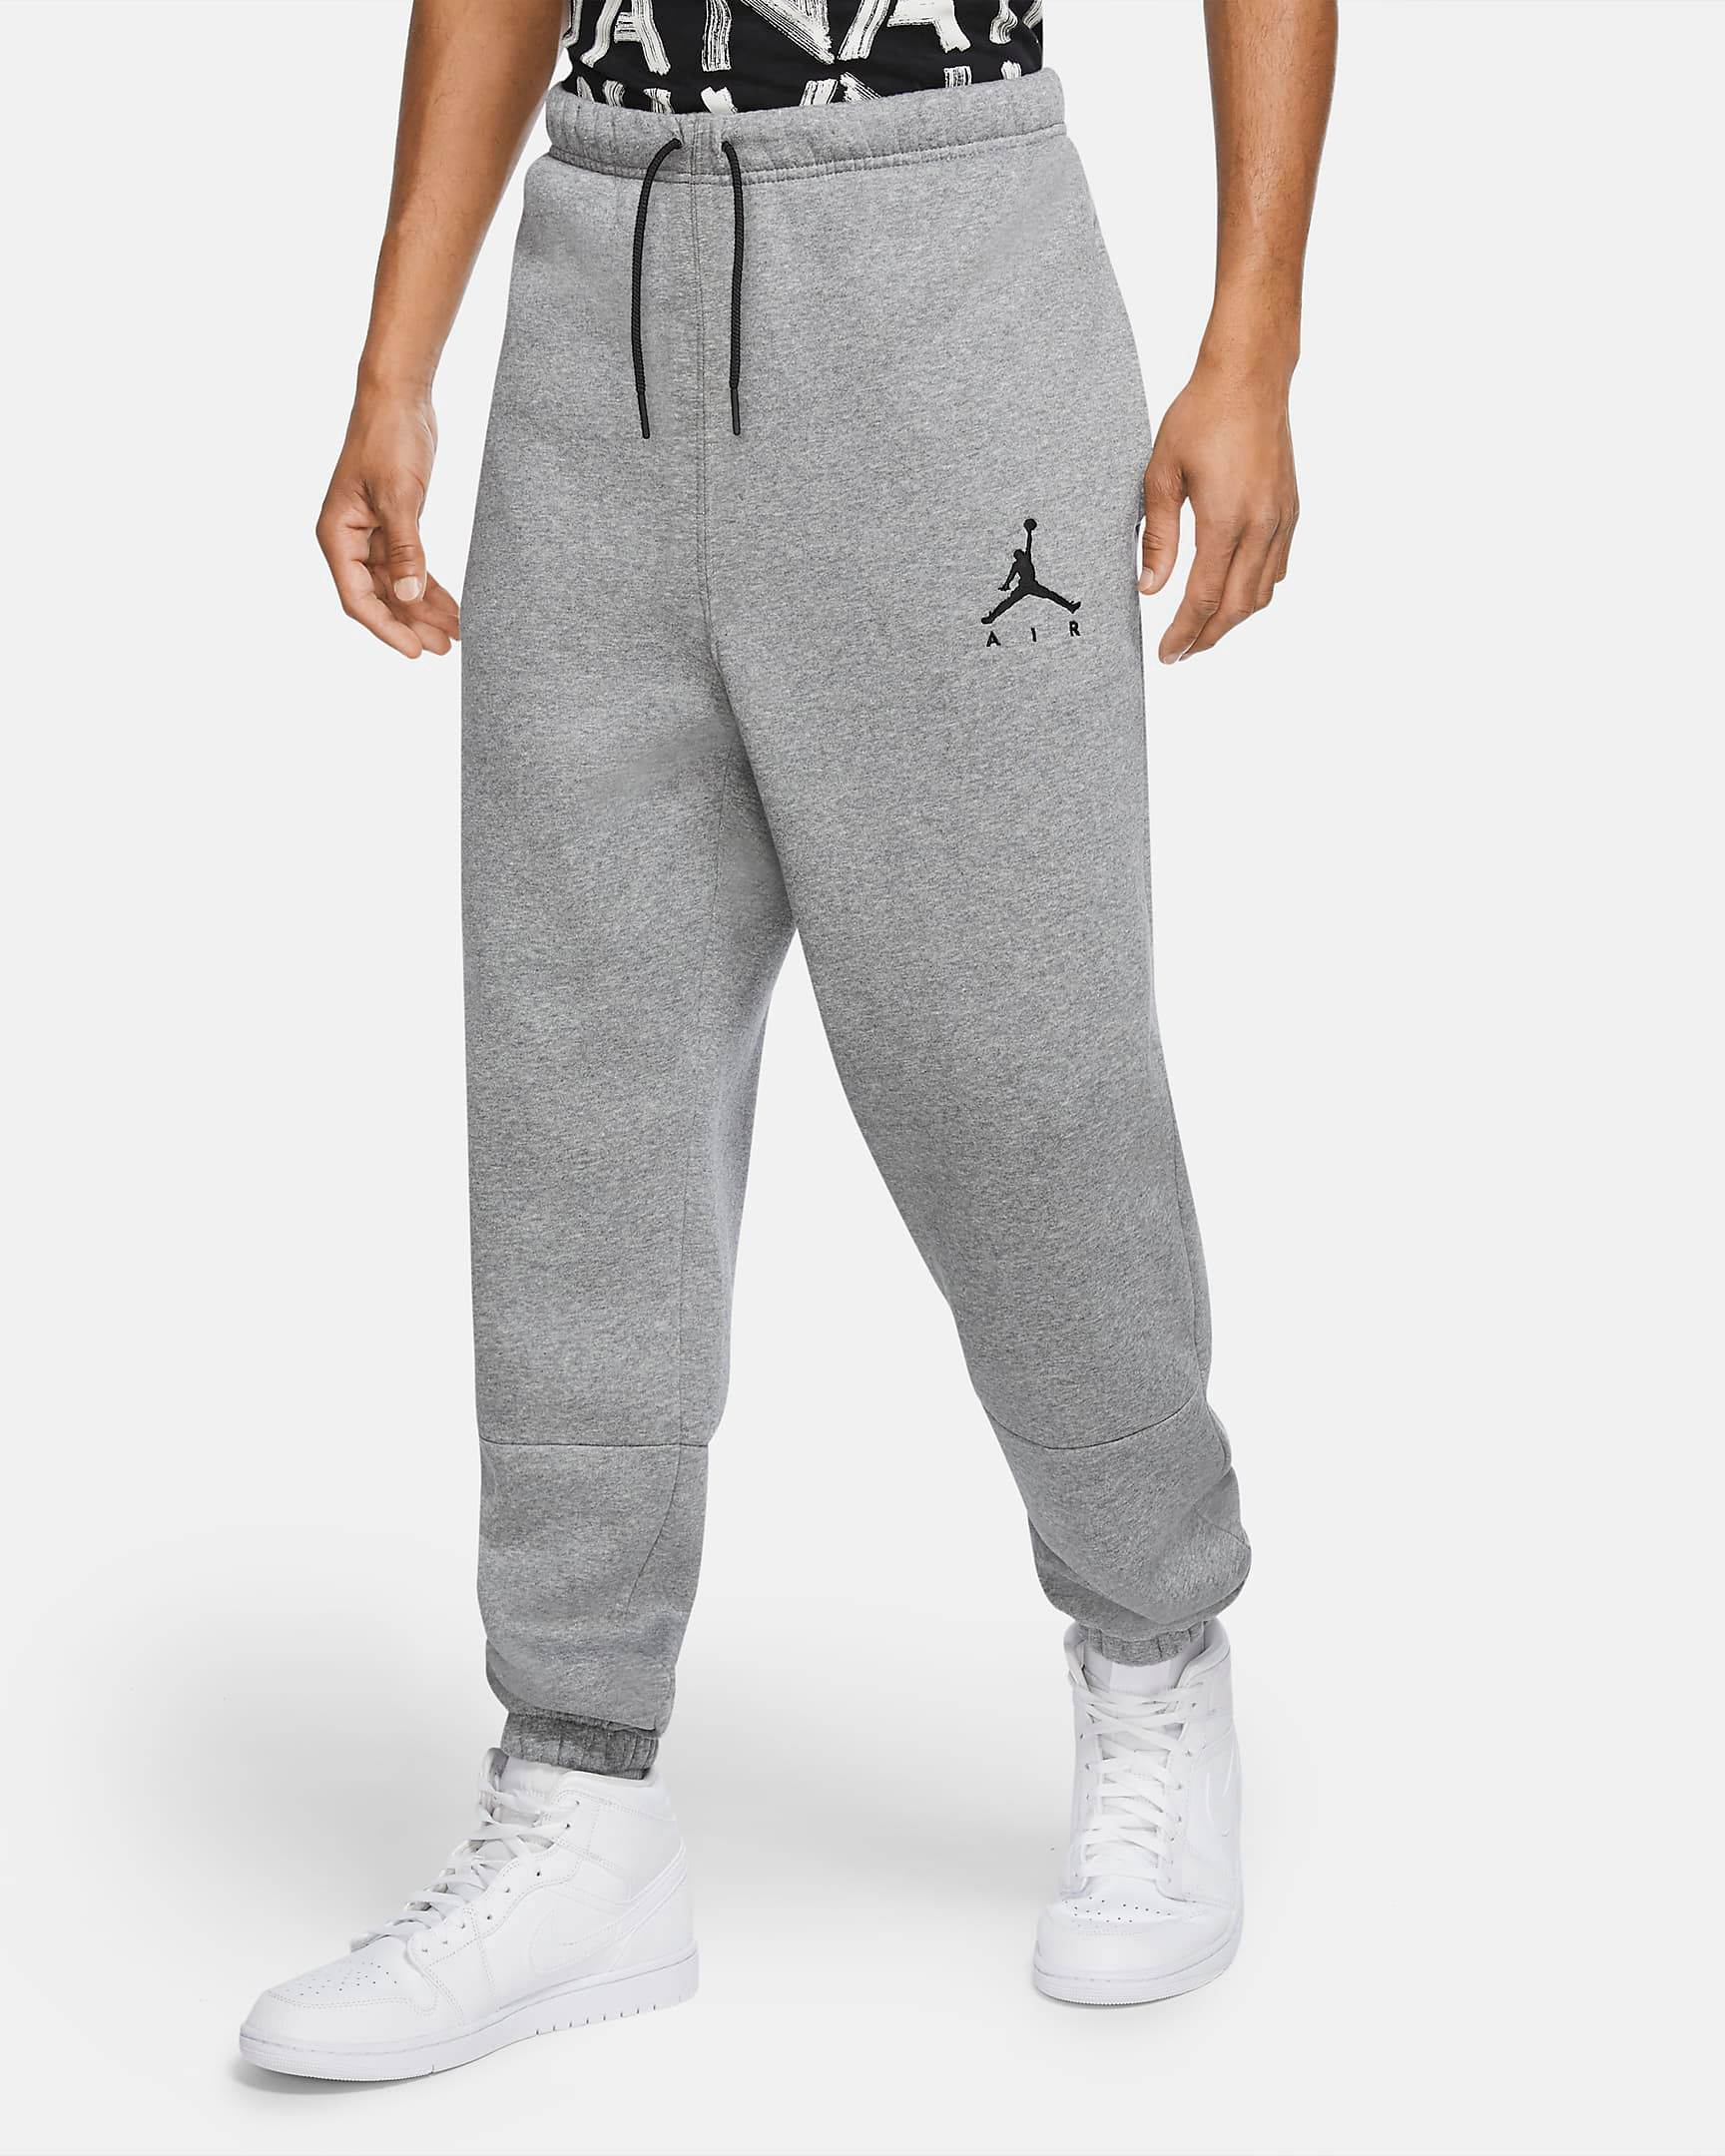 jordan-jumpman-air-fleece-pants-grey